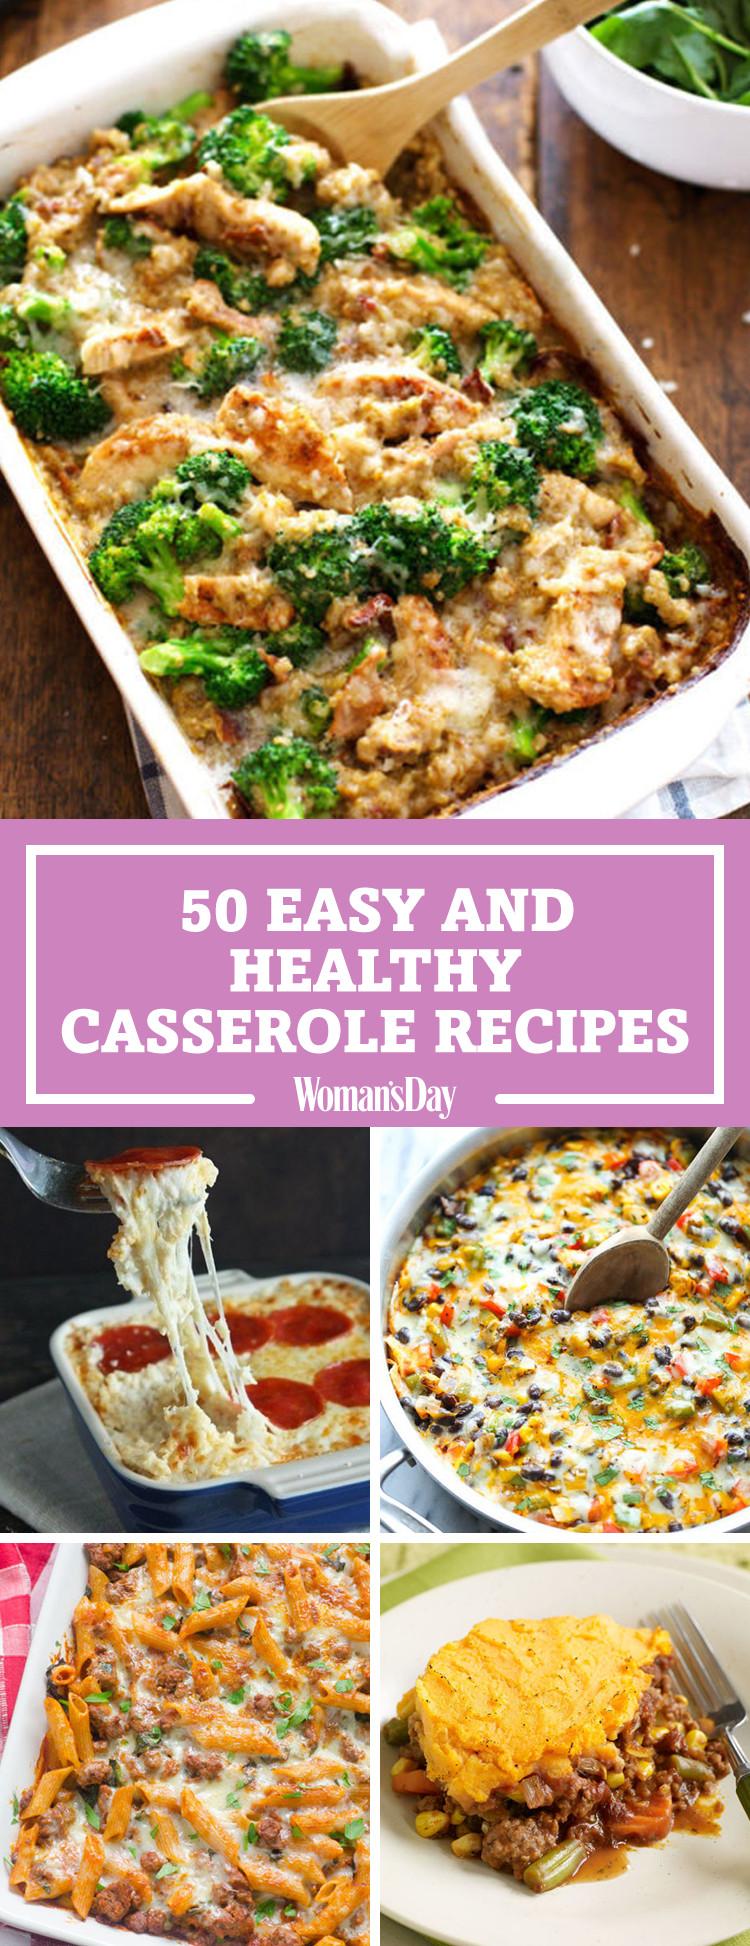 Easy Casseroles Healthy  54 Easy Healthy Casseroles Best Casserole Recipes & Ideas